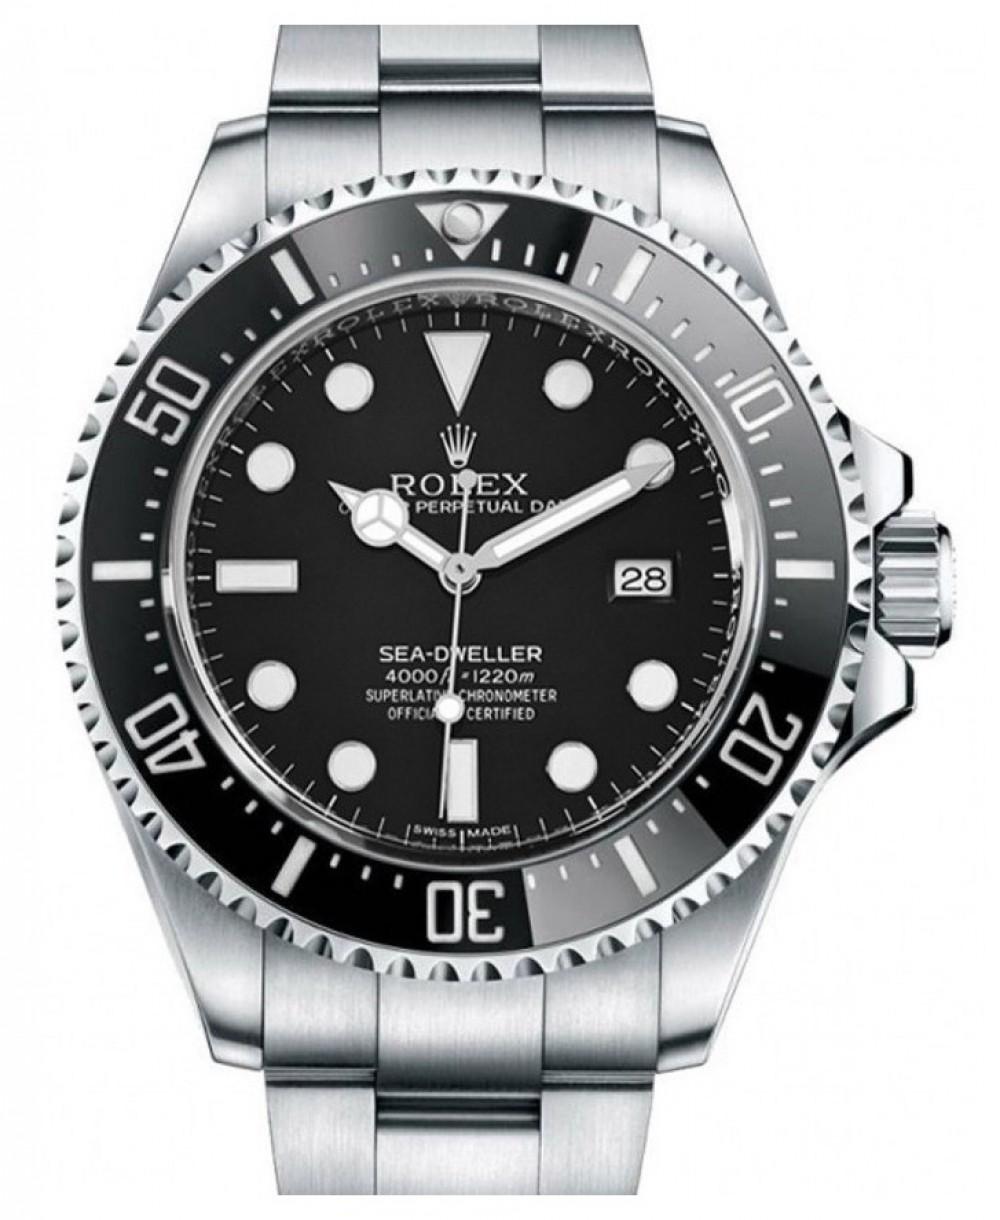 57807a97de2 More Views. Rolex Sea-Dweller 4000 Stainless Steel Black Maxi Dial &  Ceramic Bezel Oyster Bracelet 40mm